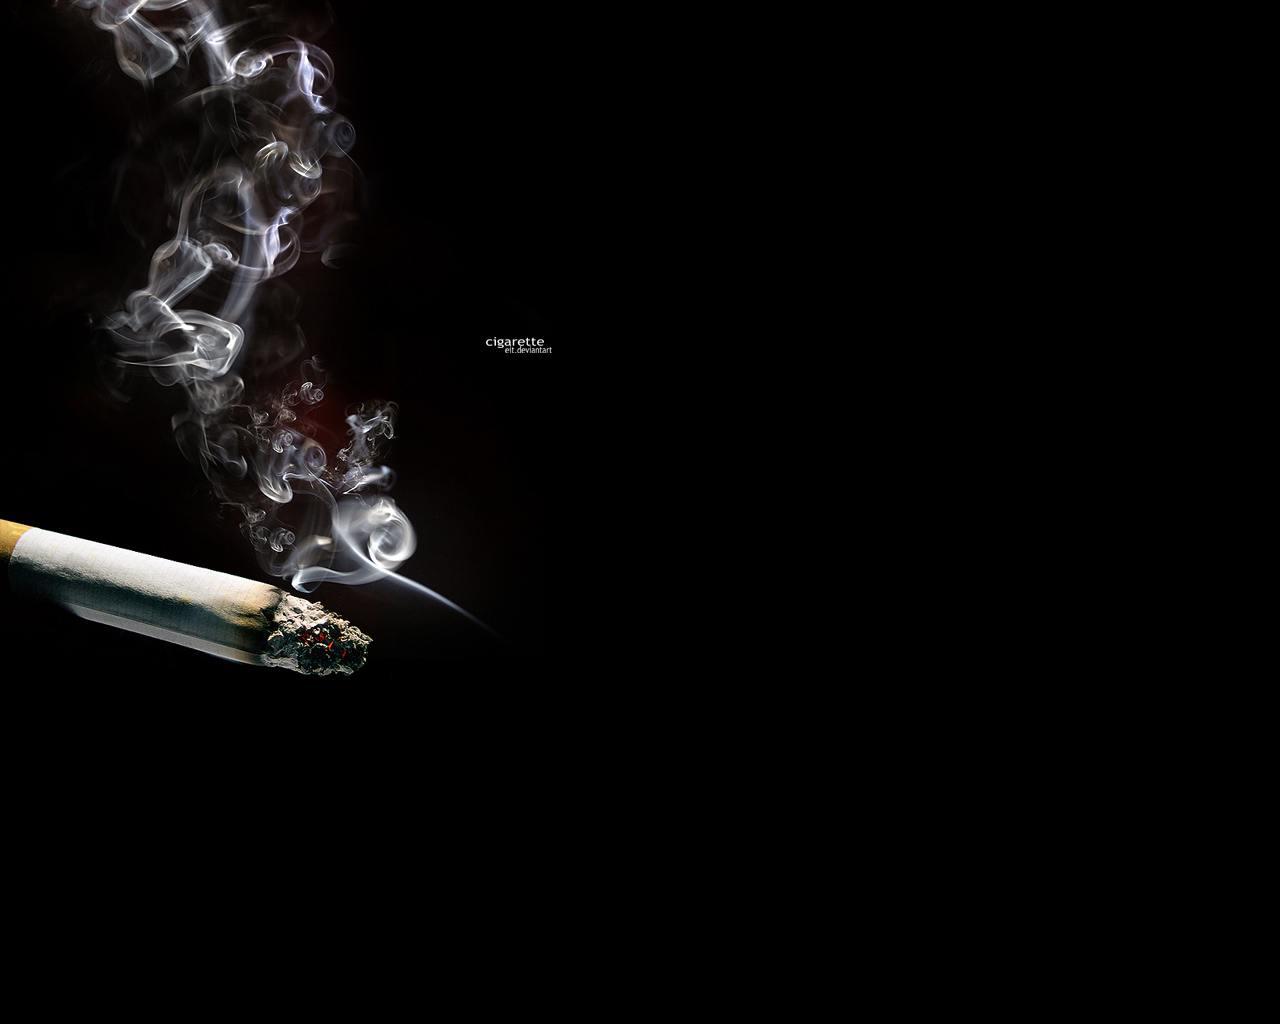 Cigarette Smoking Wallpapers